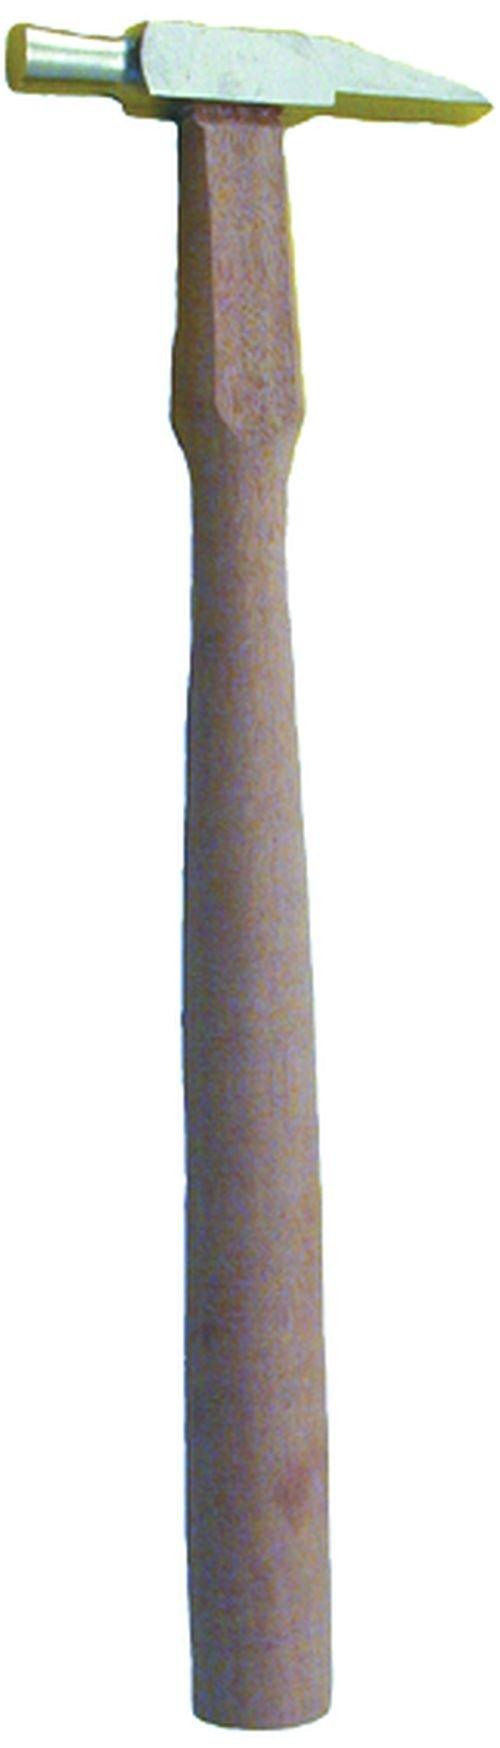 Enkay 906-C  Jewelers Hammer, Carded